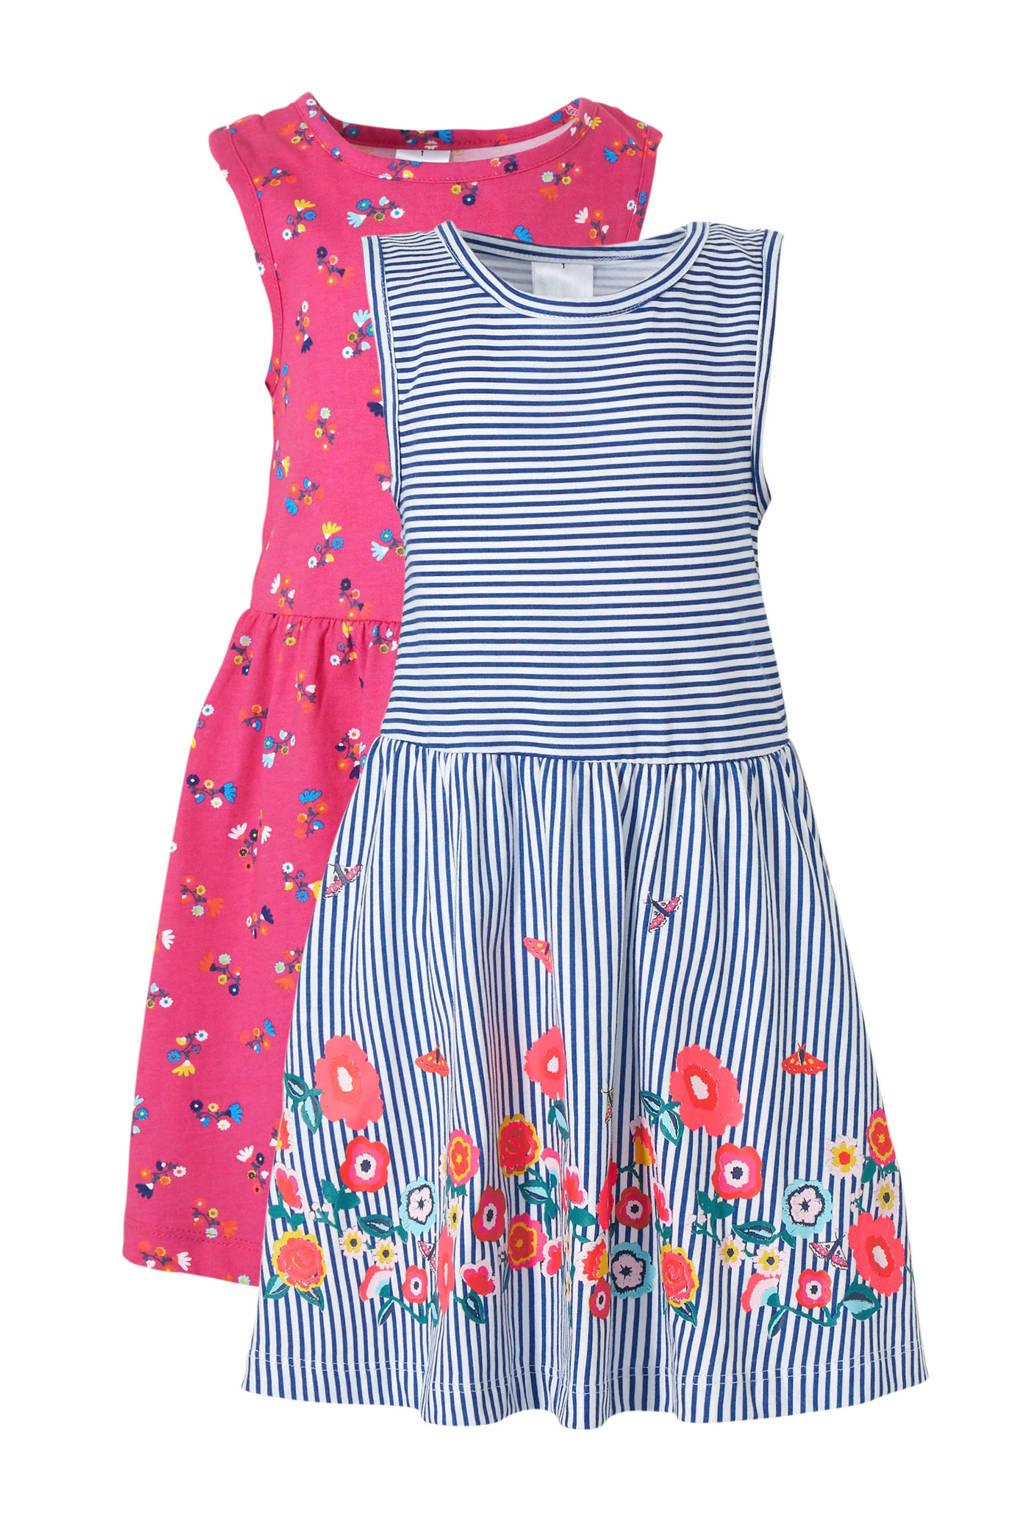 C&A Palomino jurk -  set van 2, Blauw/wit/roze